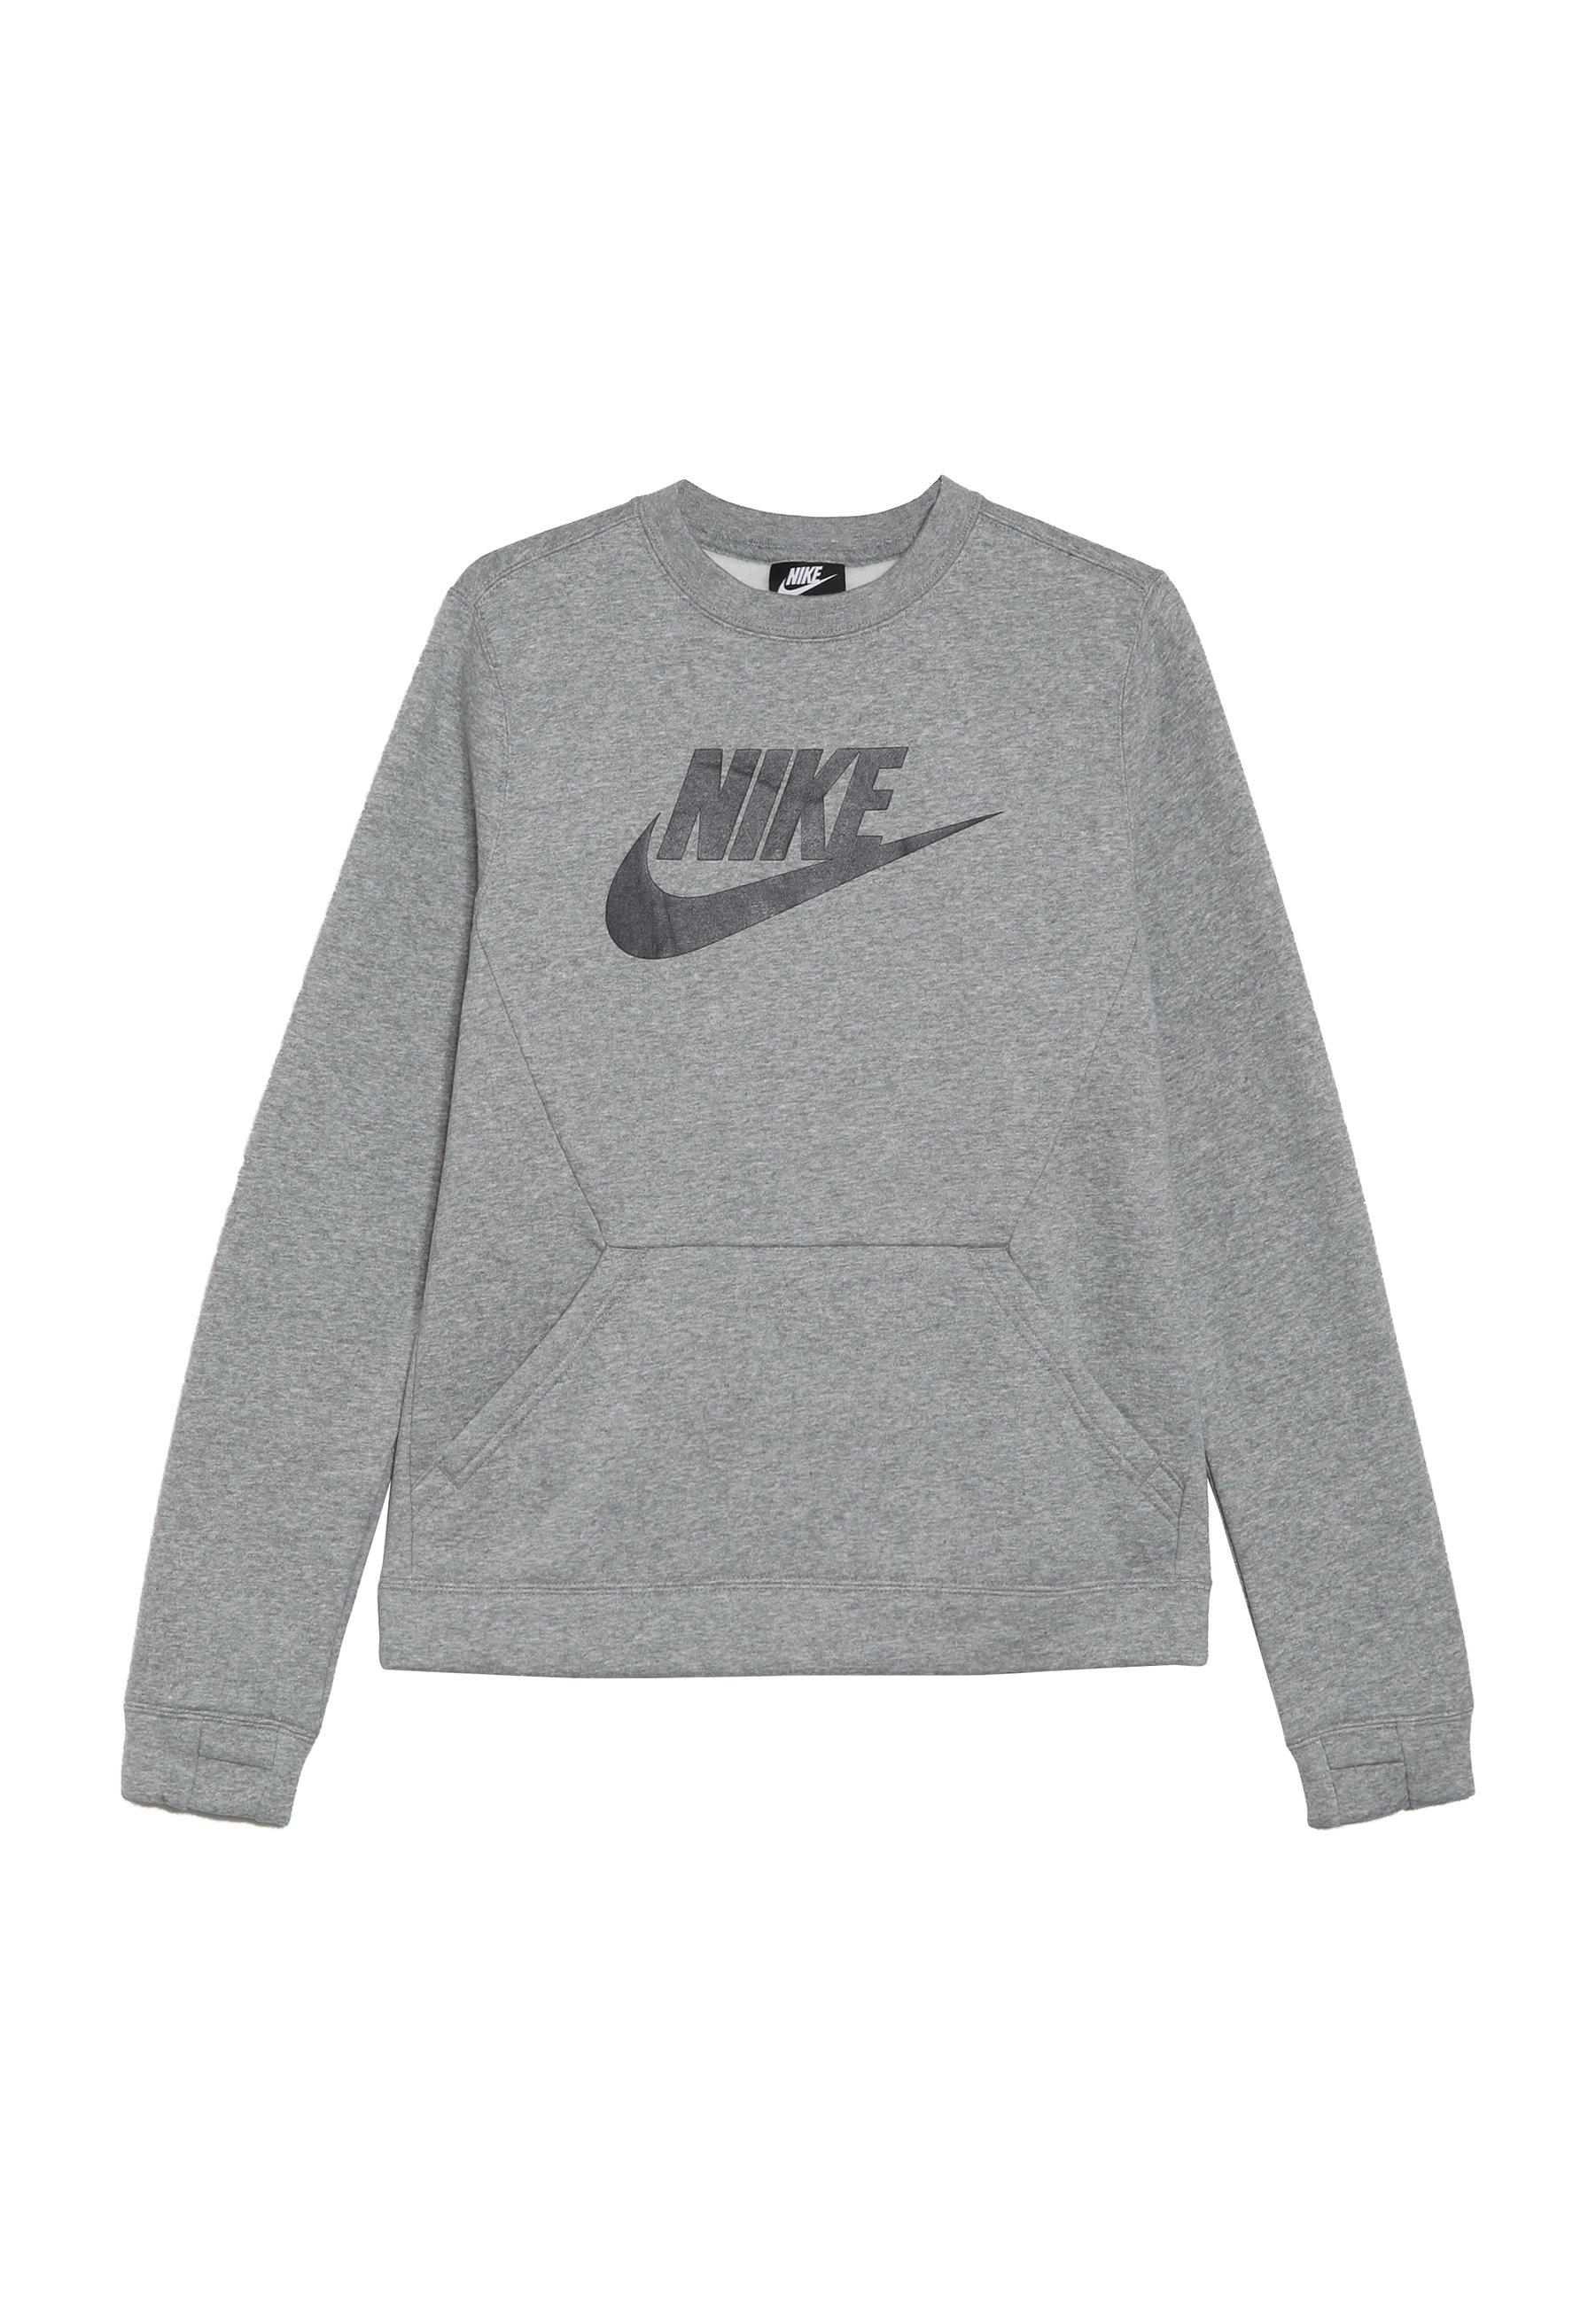 Nike Sportswear AIR CREW Sweatshirt dark grey heather